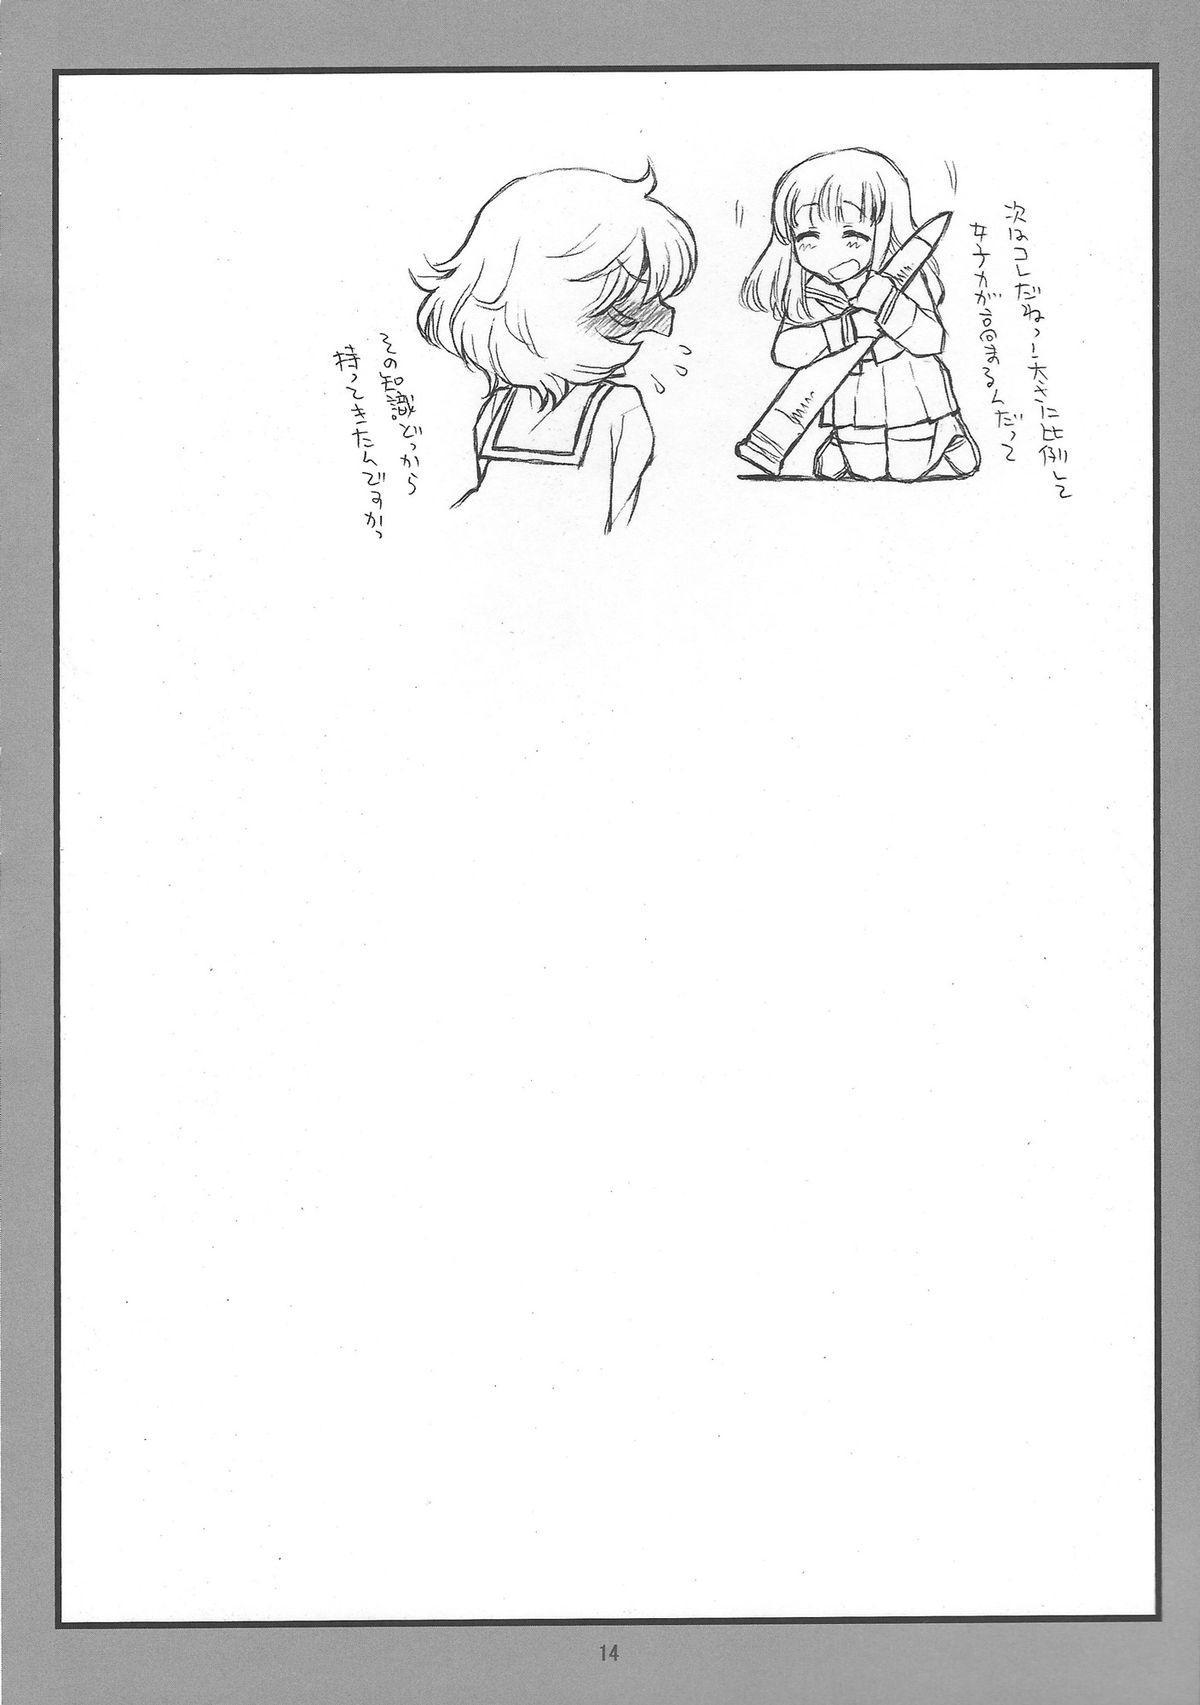 (C84) [bolze.] 「Honanie + Akiyama-dono Sennyudaisakusen (Sippai)」 (Girls und Panzer) 13